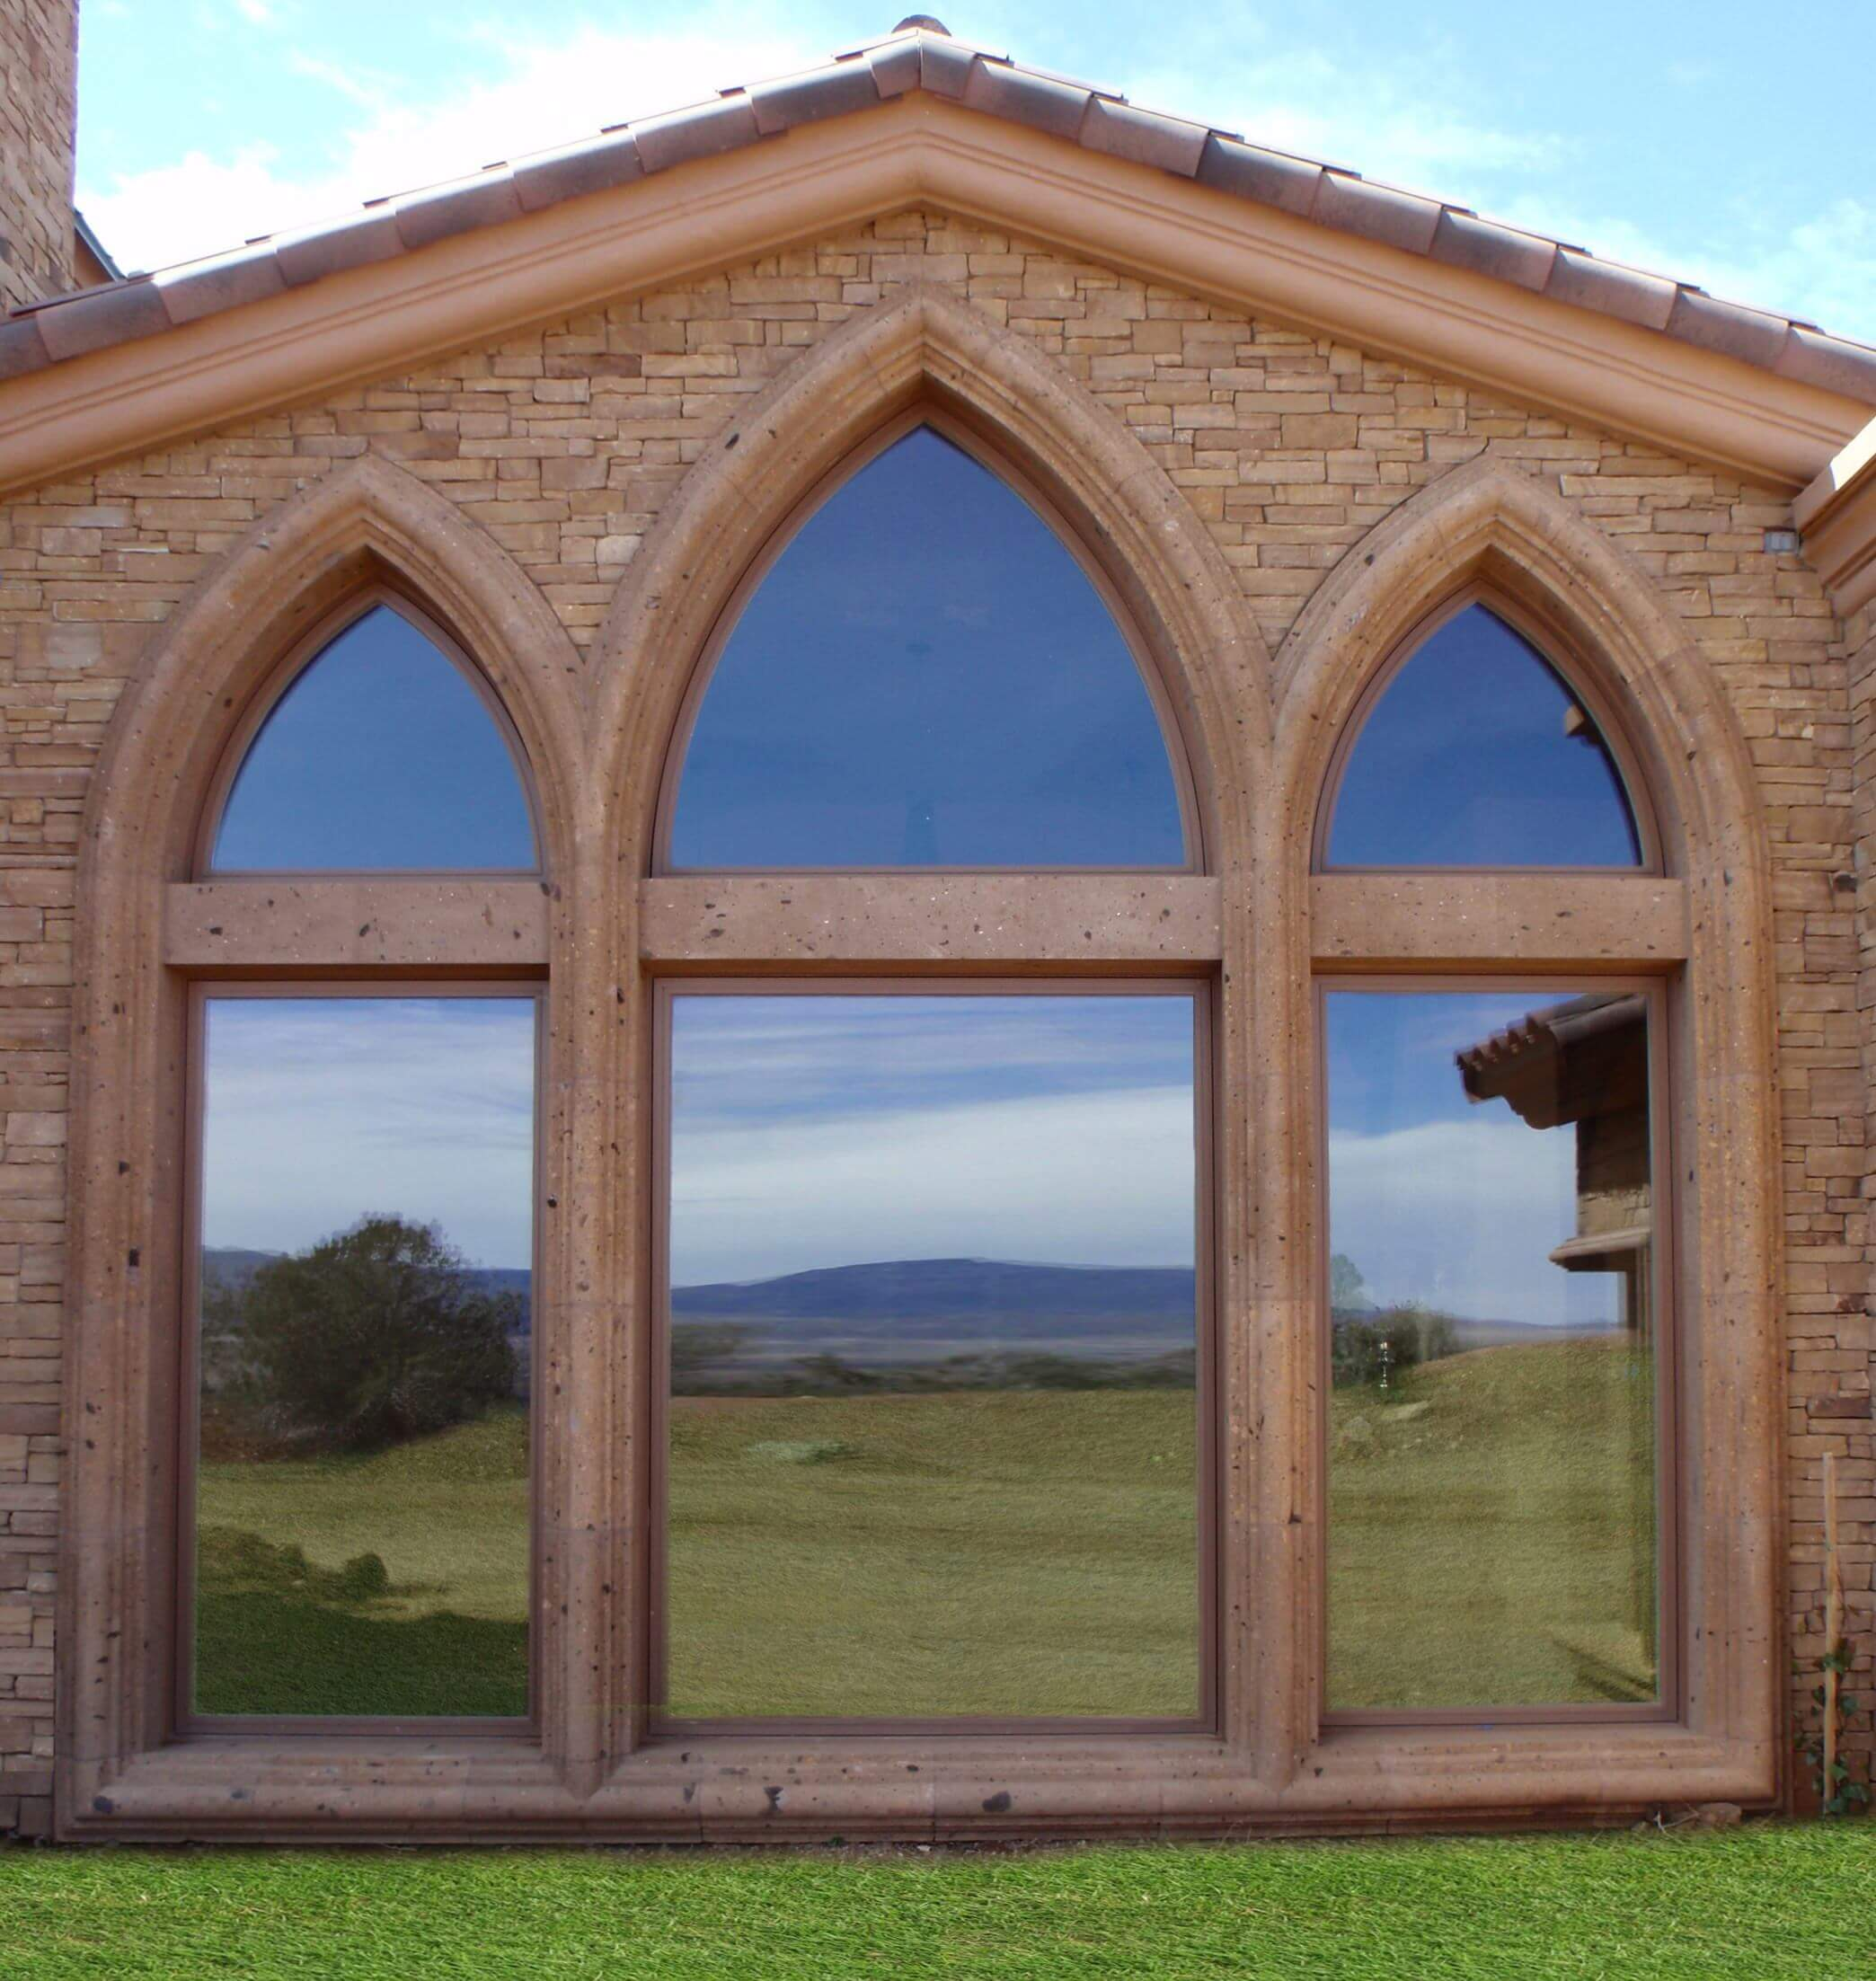 5-Gothic-Window-Surrounds-in-Tobacco-Cantera-Stone